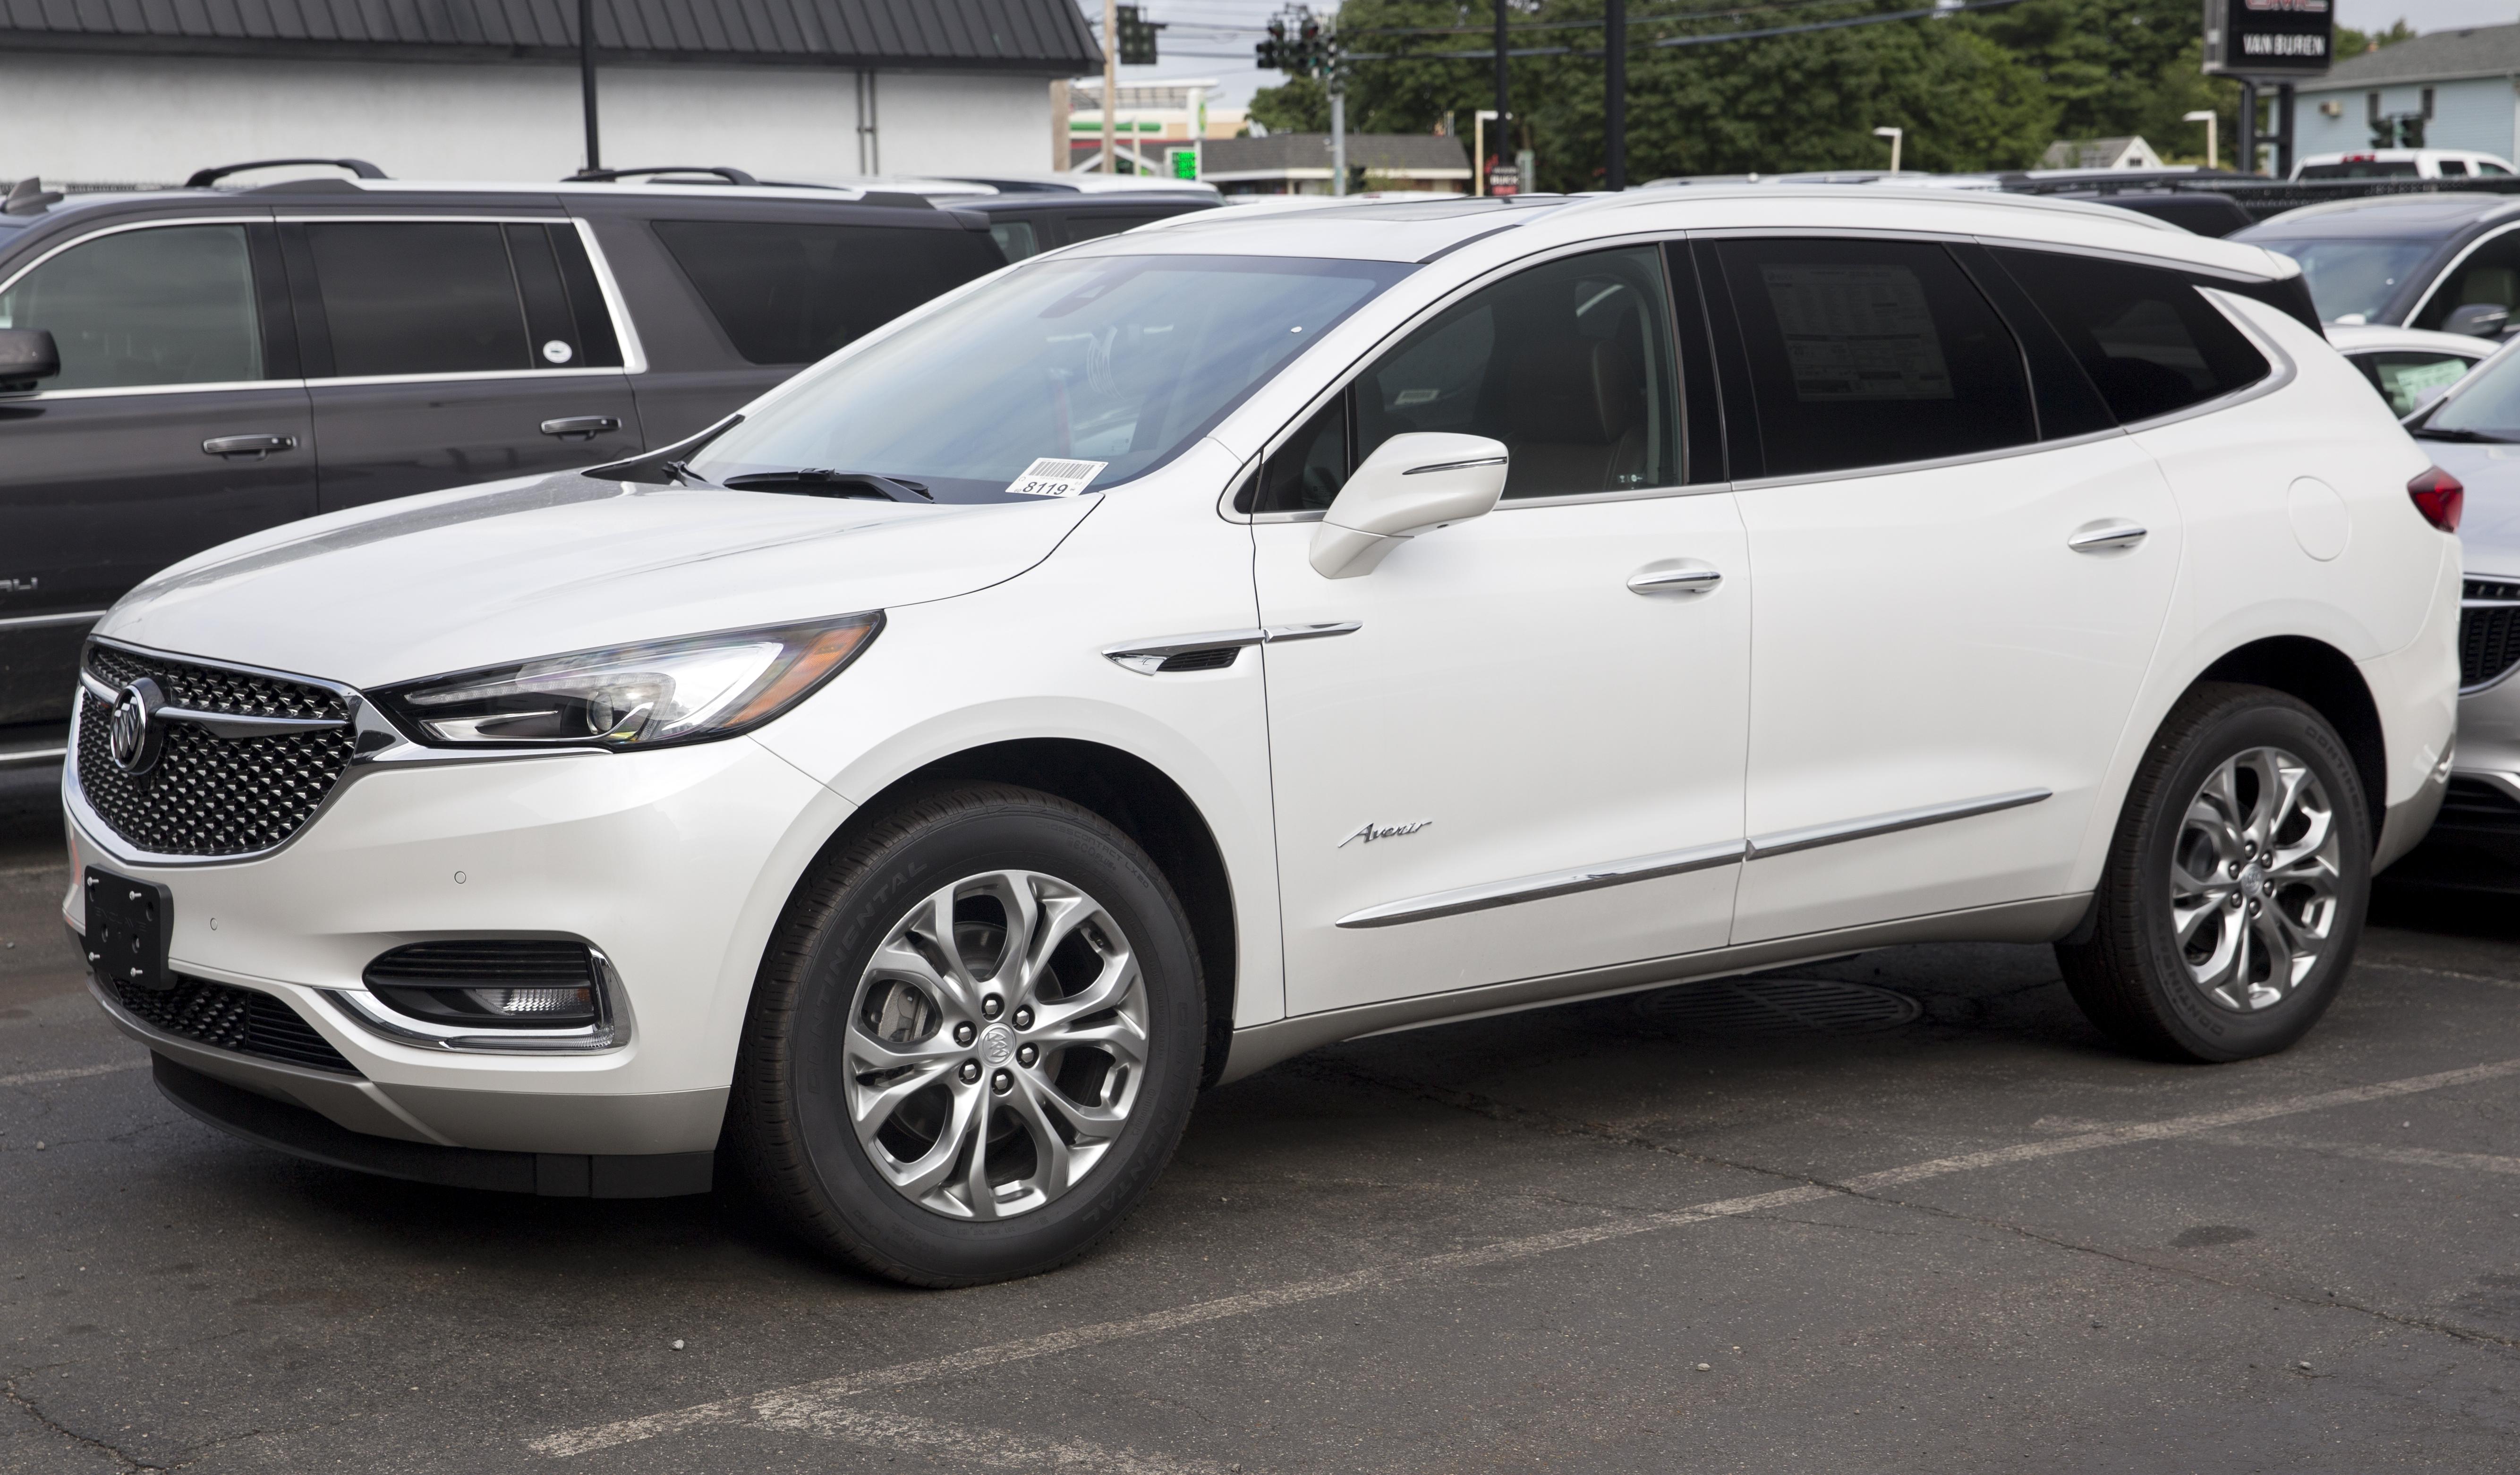 File:2018 Buick Enclave Avenir AWD (white), front left.jpg ...